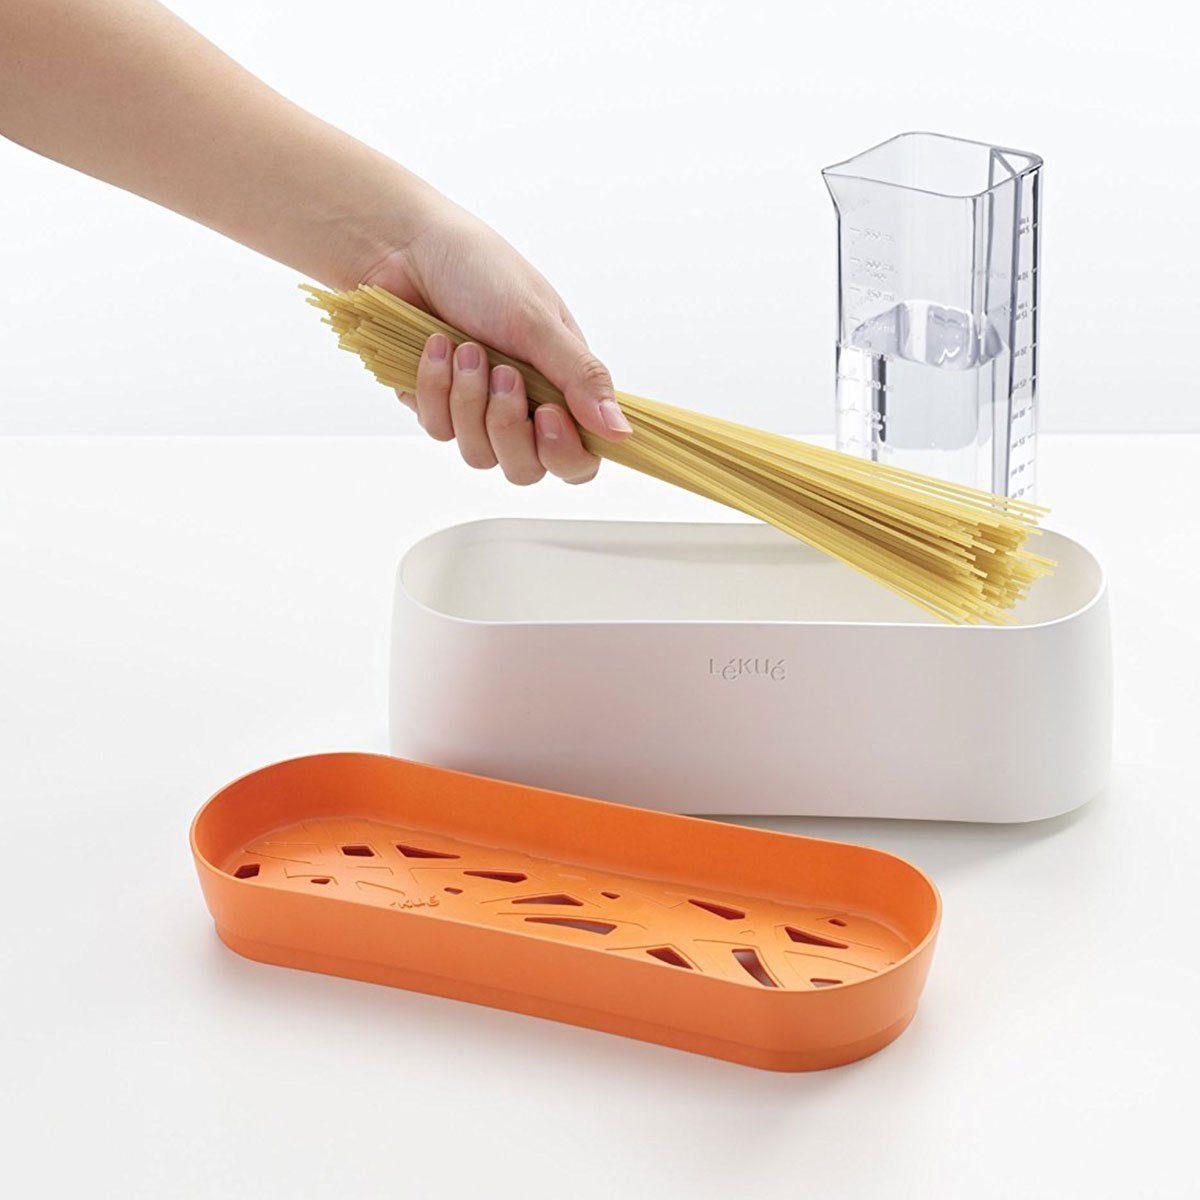 LEKUE Lekue Mikrowellen Pasta Cooker